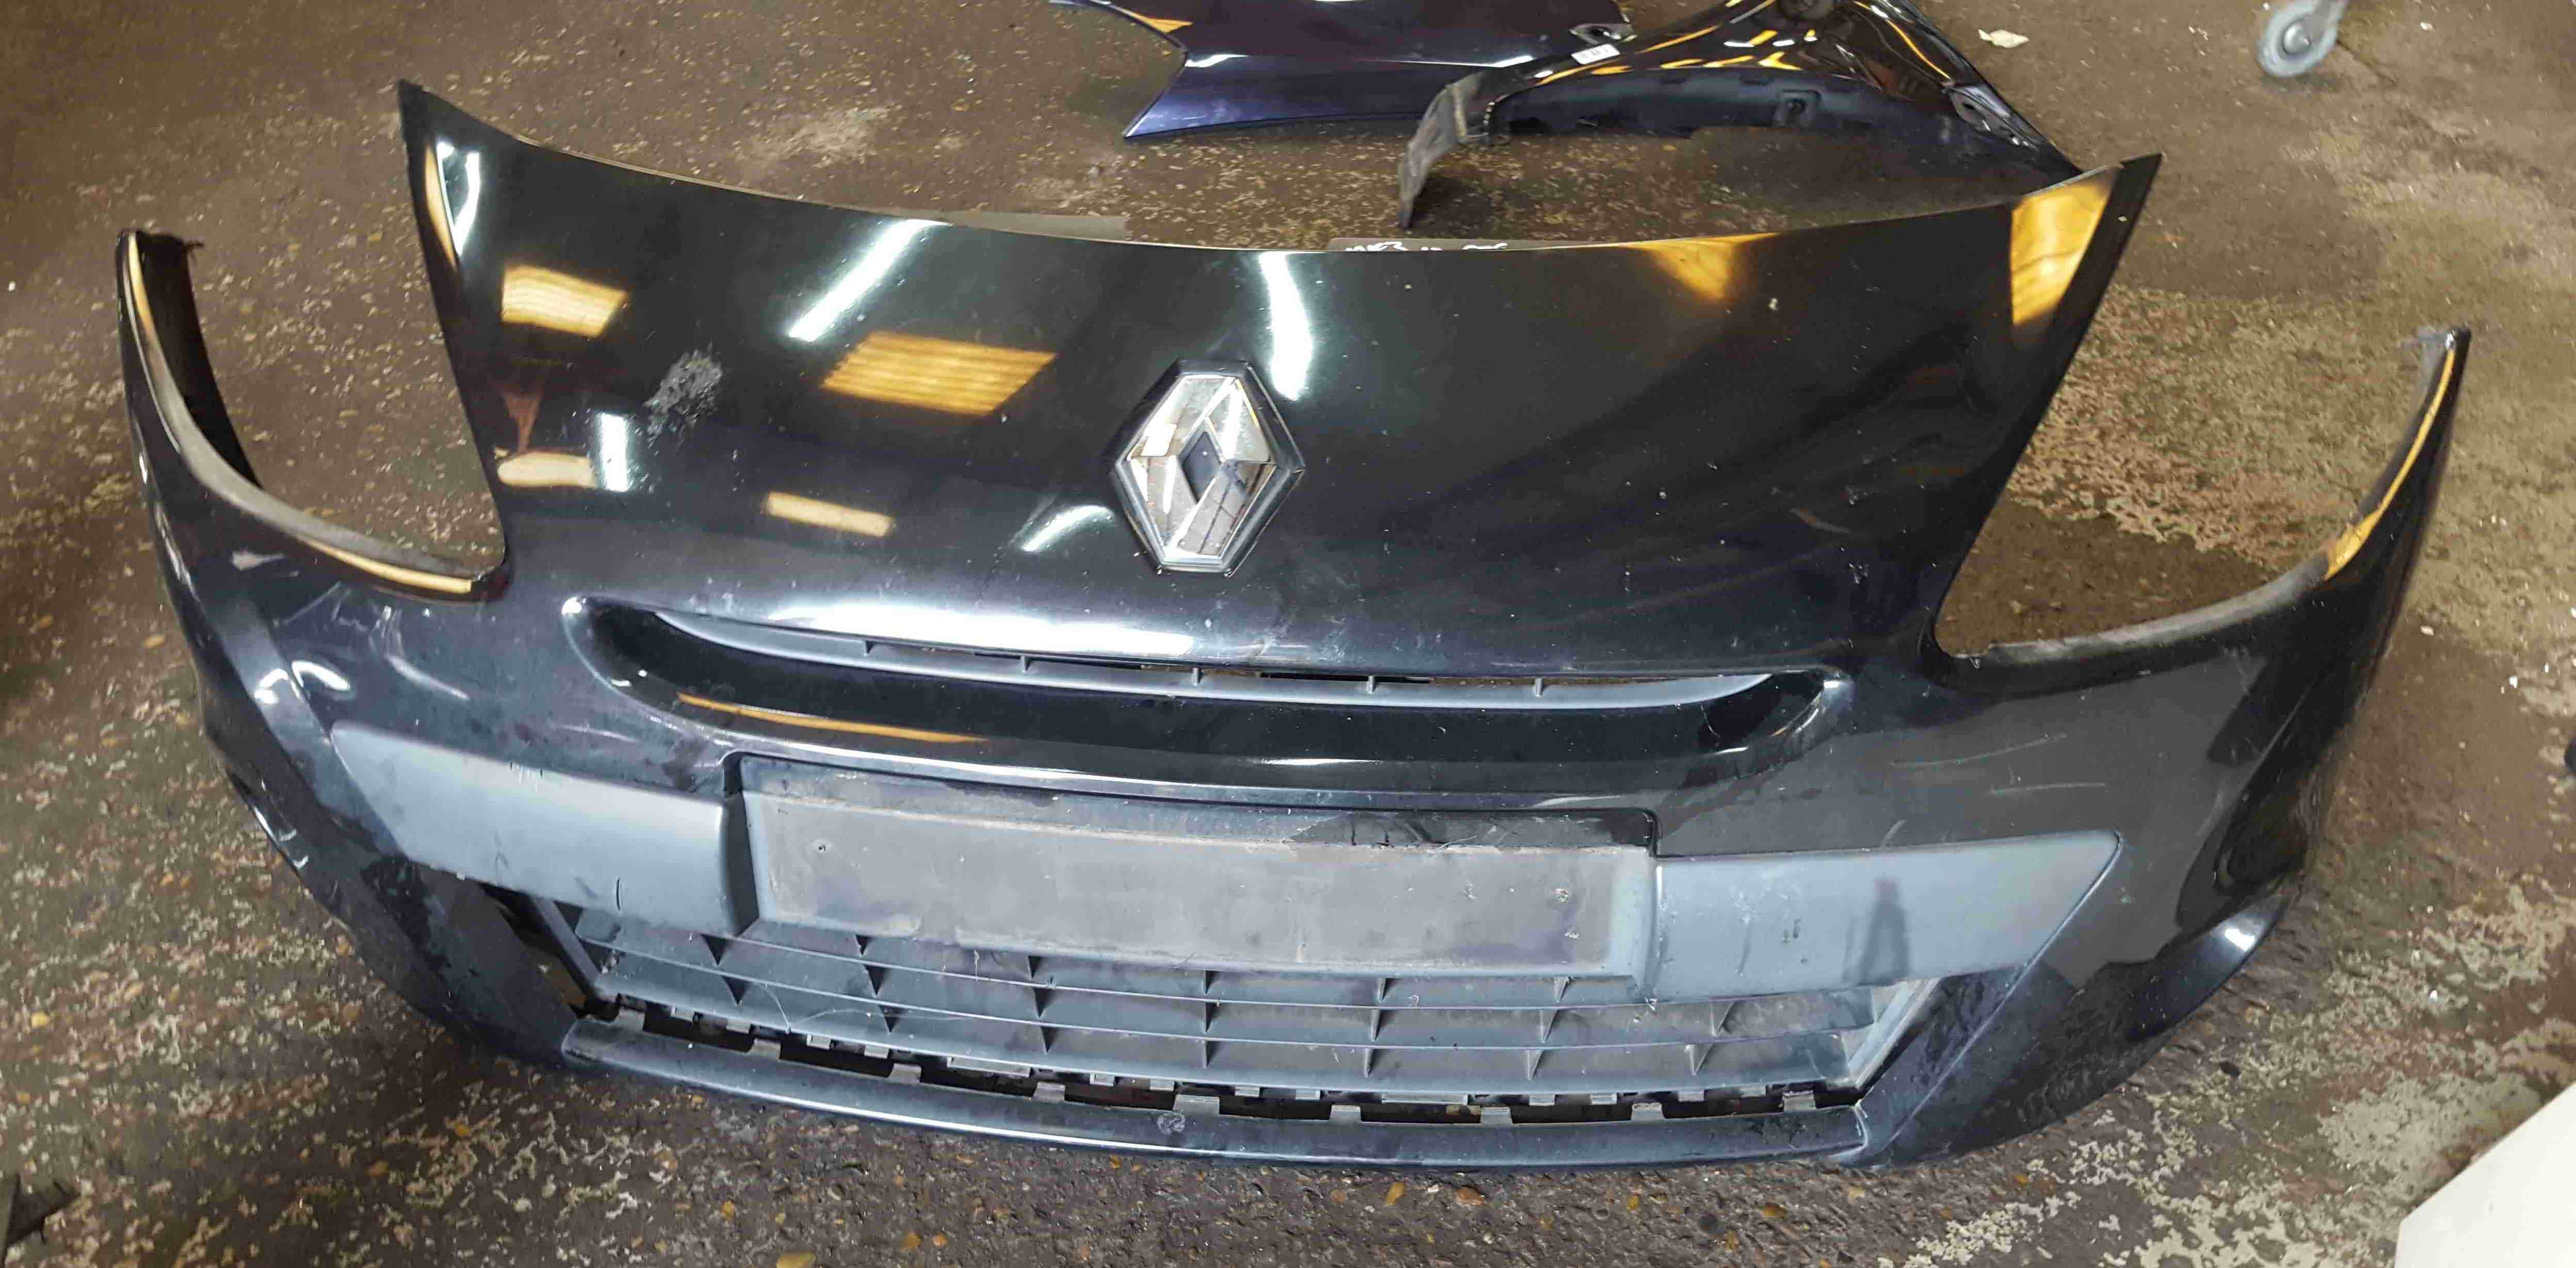 Renault Clio MK3 2009-2012 Front Bumper Black 676 185